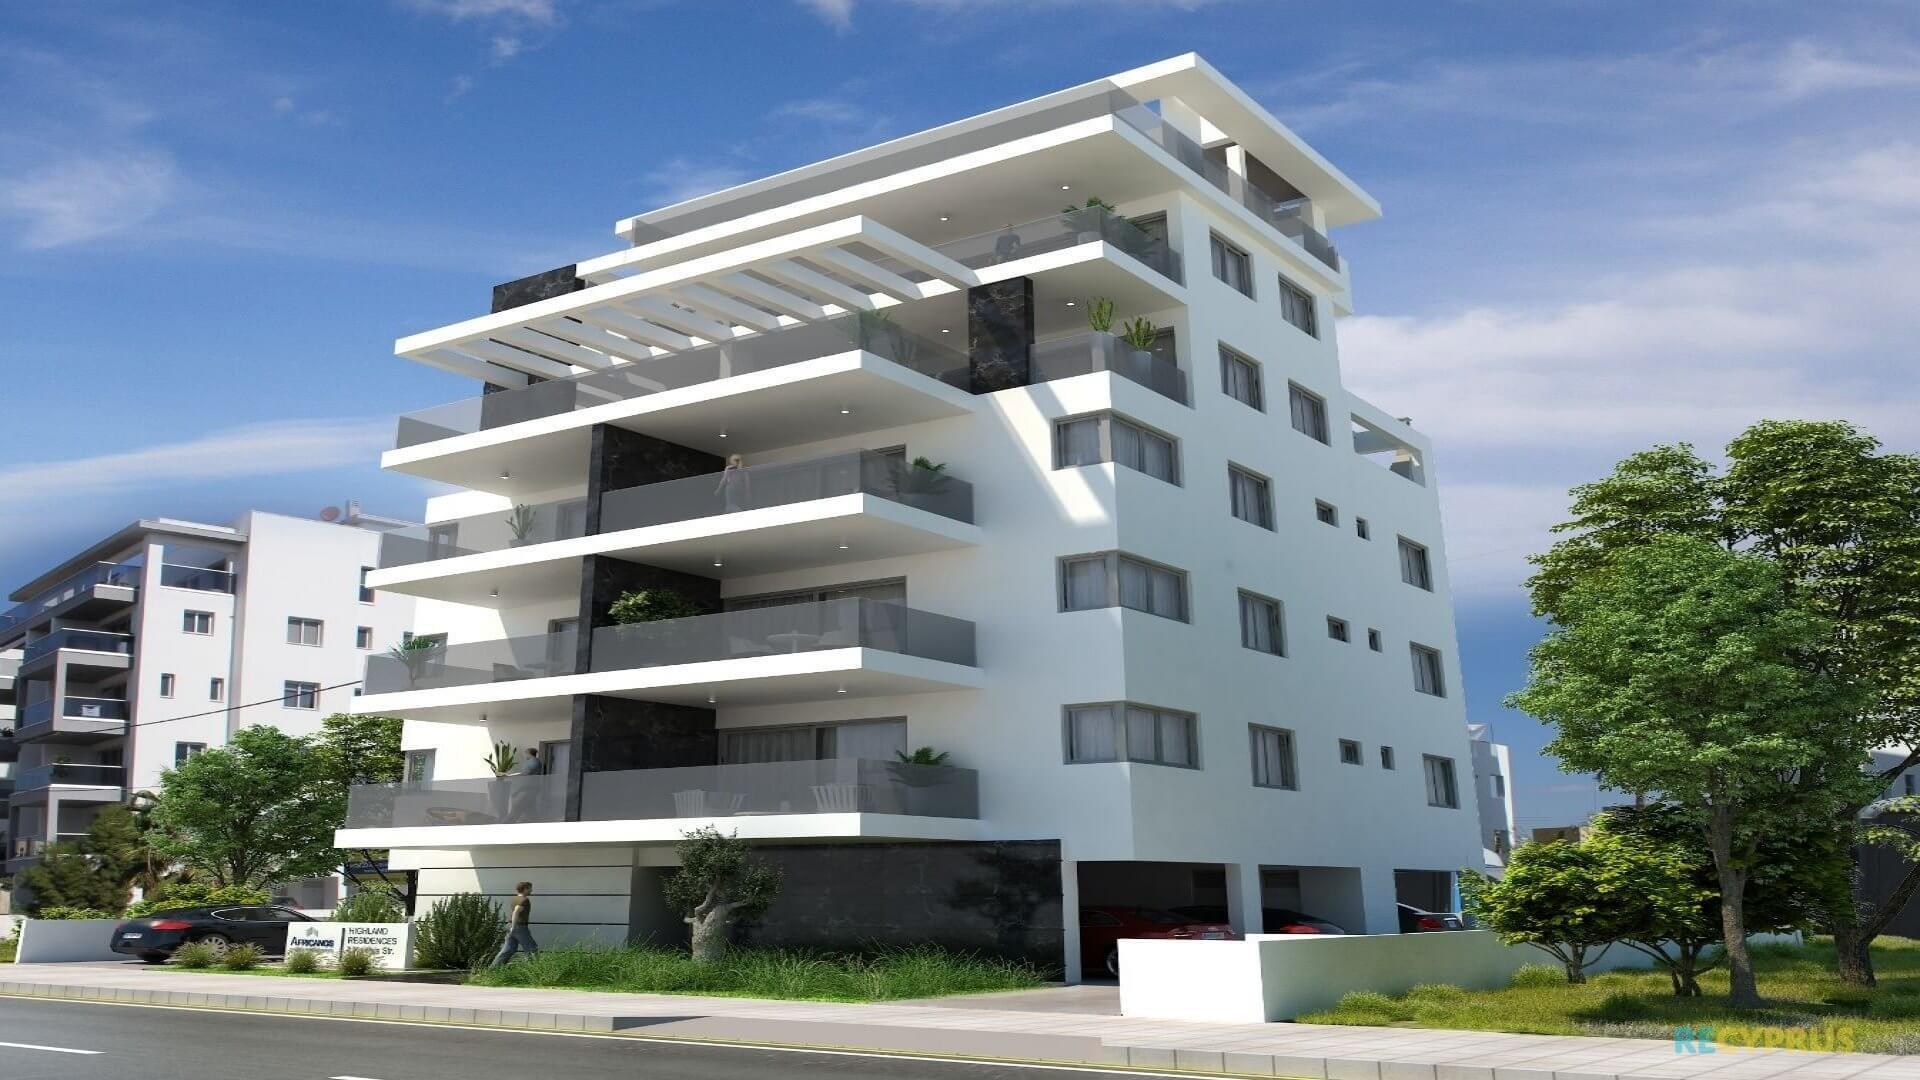 Apartment for sale City Center Larnaca Cyprus 1 3601